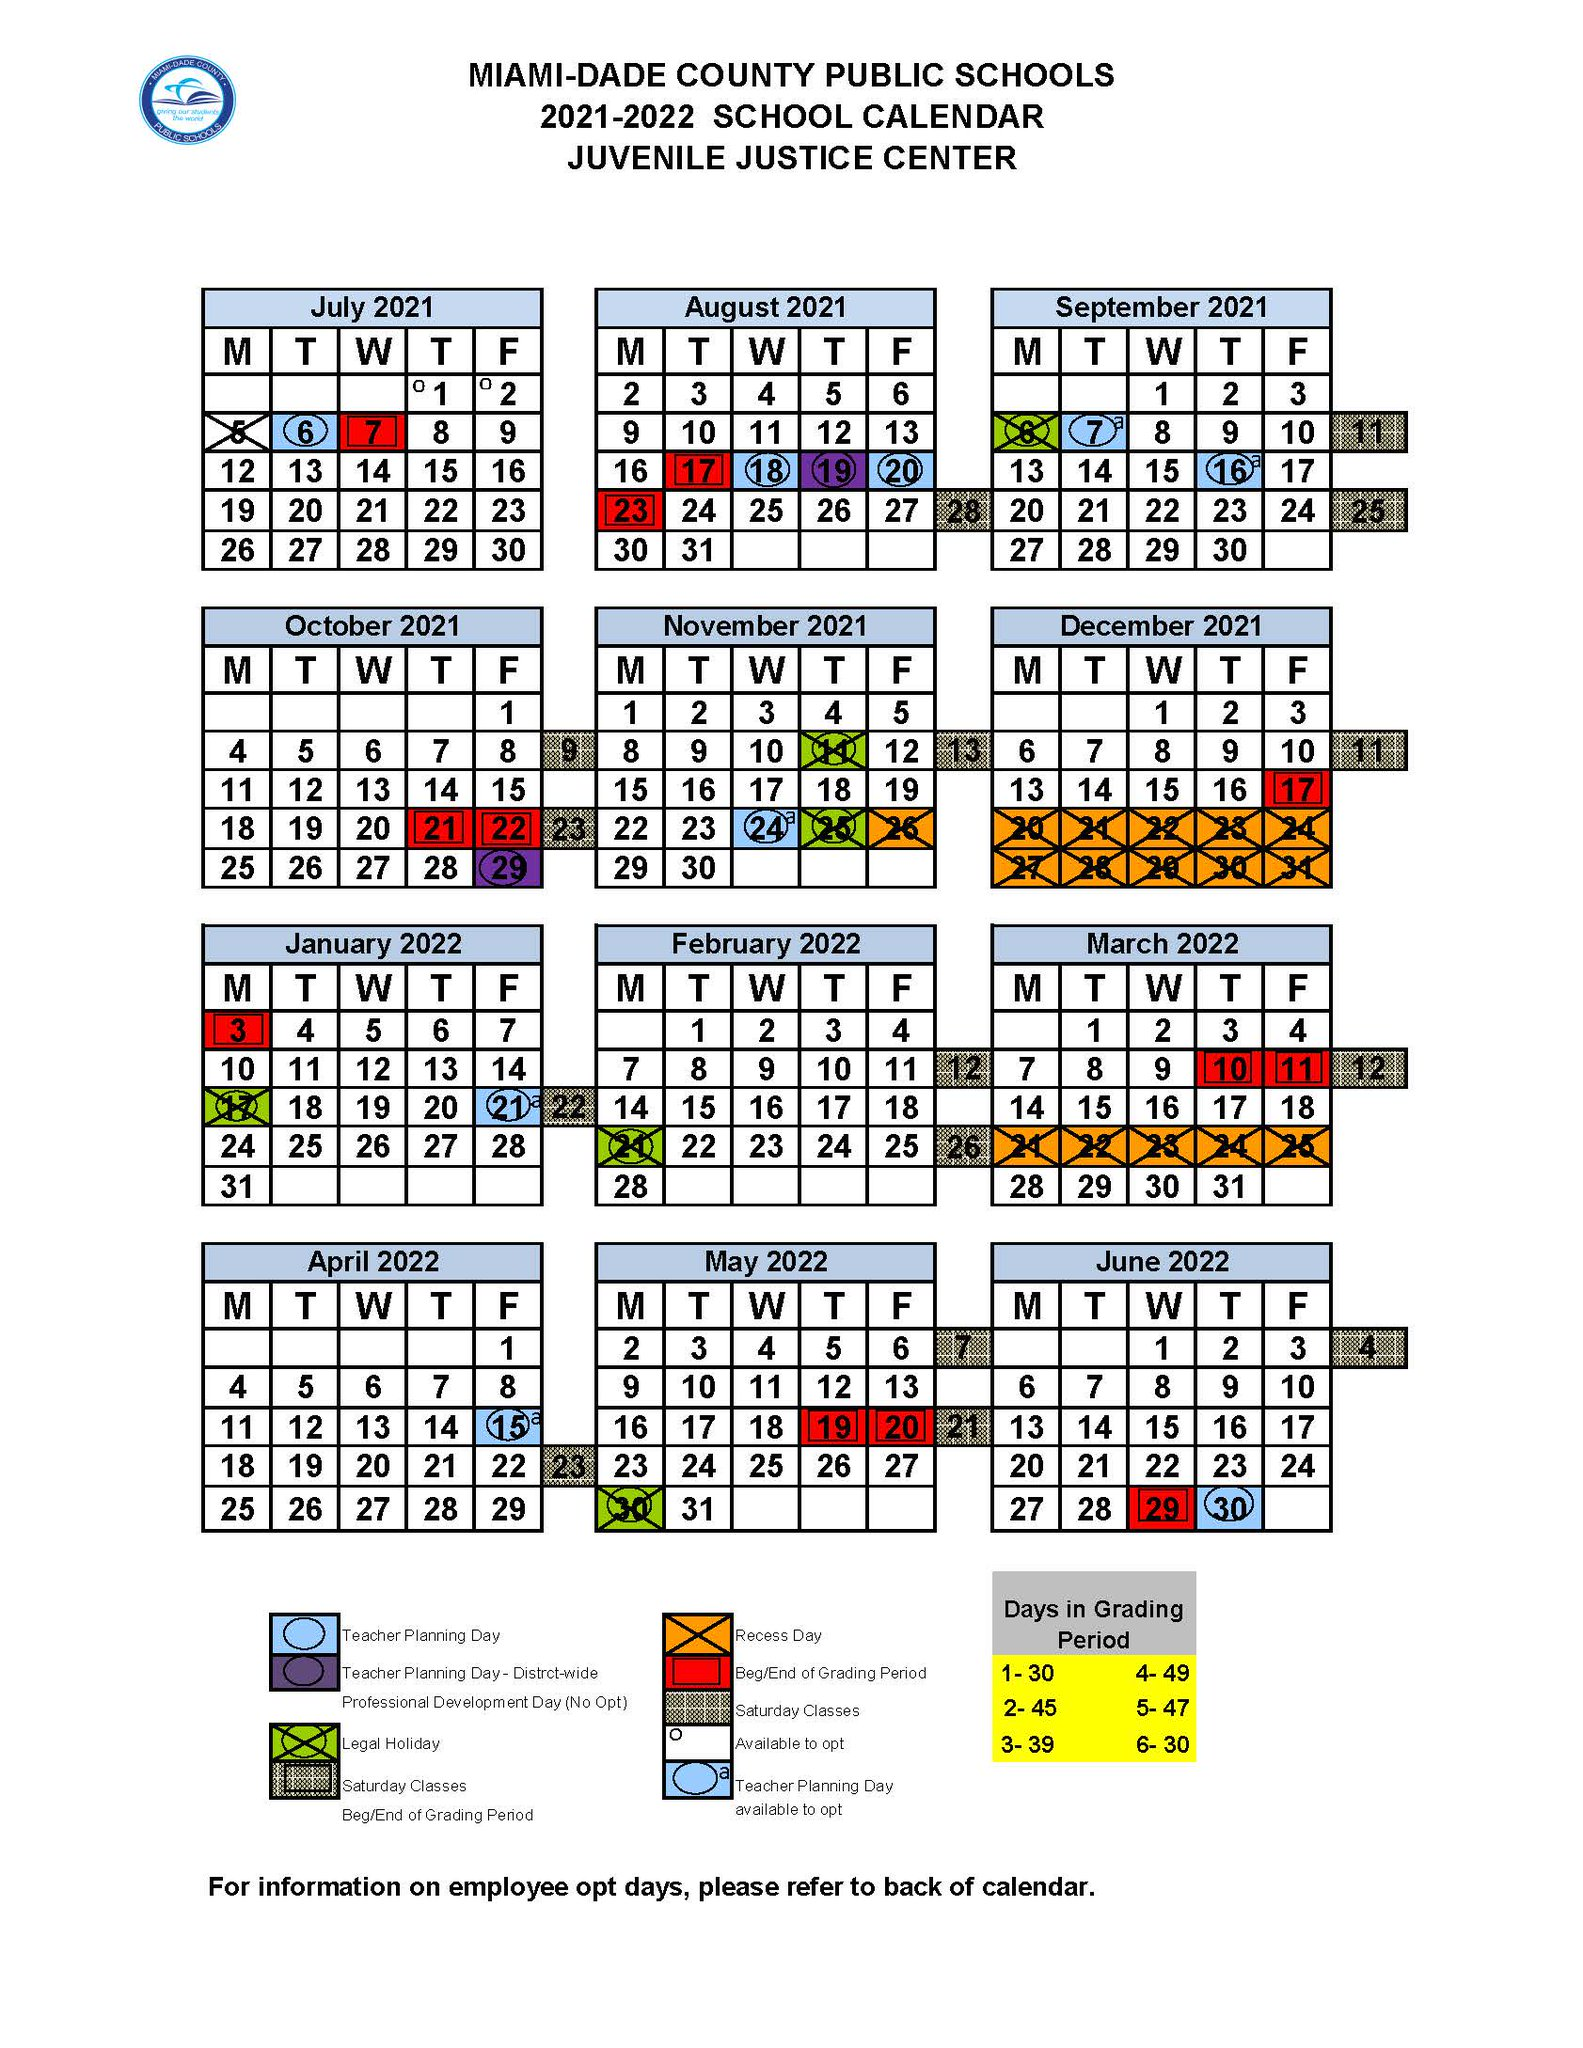 Miami Dade Public Schools Calendar 2022.Miami Dade Schools On Twitter Miami Dade County School Board Approves 2021 2022 Mdcps School Calendars Https T Co 2qtggtncus